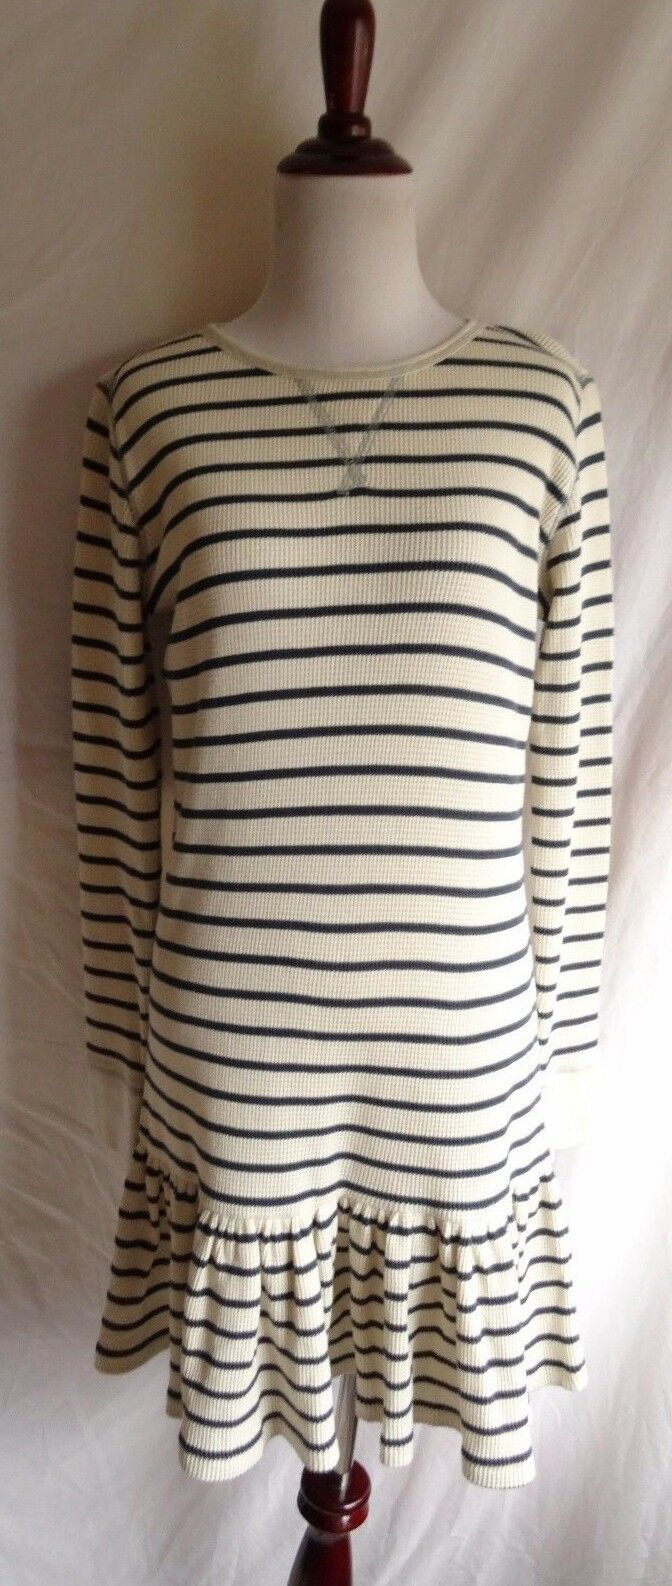 Polo Ralph Lauren M Navy bluee Ivory Stripe Thermal Waffle Knit Shirt Dress